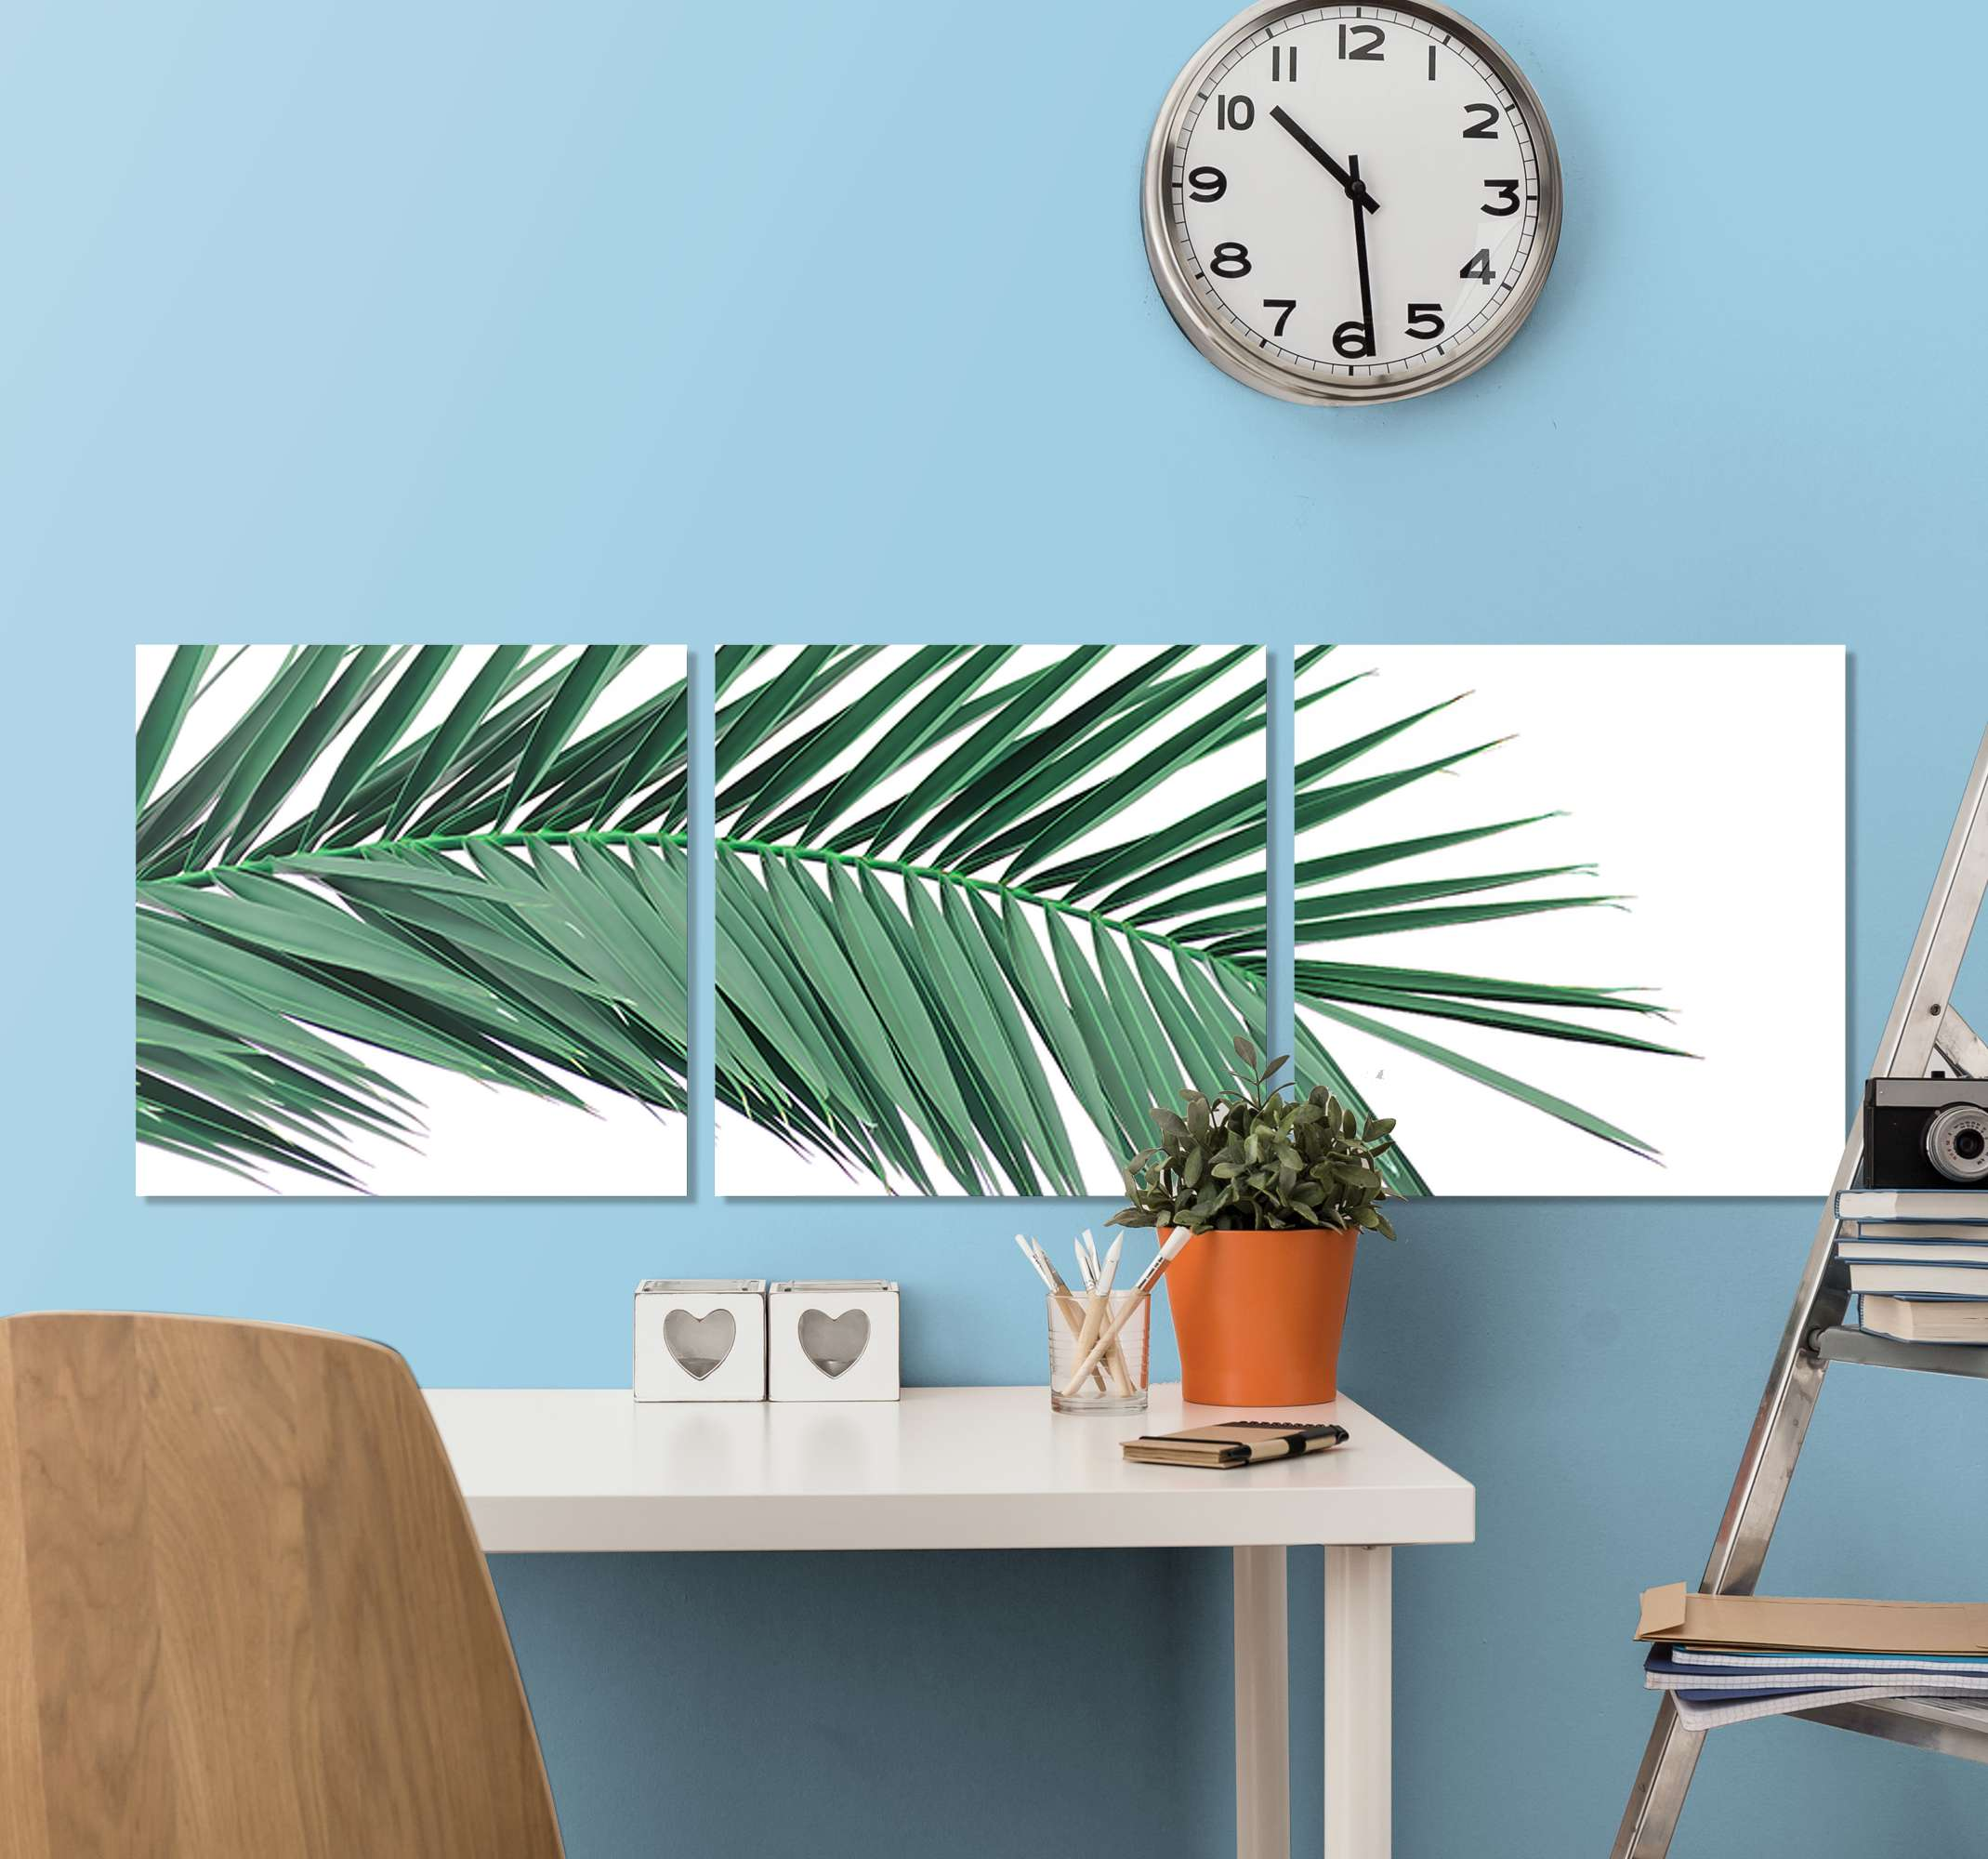 TenStickers. εκτυπώσεις σε φύλλα τροπικών φυτών. φυτό καμβά τοίχου με εικόνα ενός τροπικού κλάδου με φύλλα με λευκό φόντο. εγγραφείτε για έκπτωση 10%.